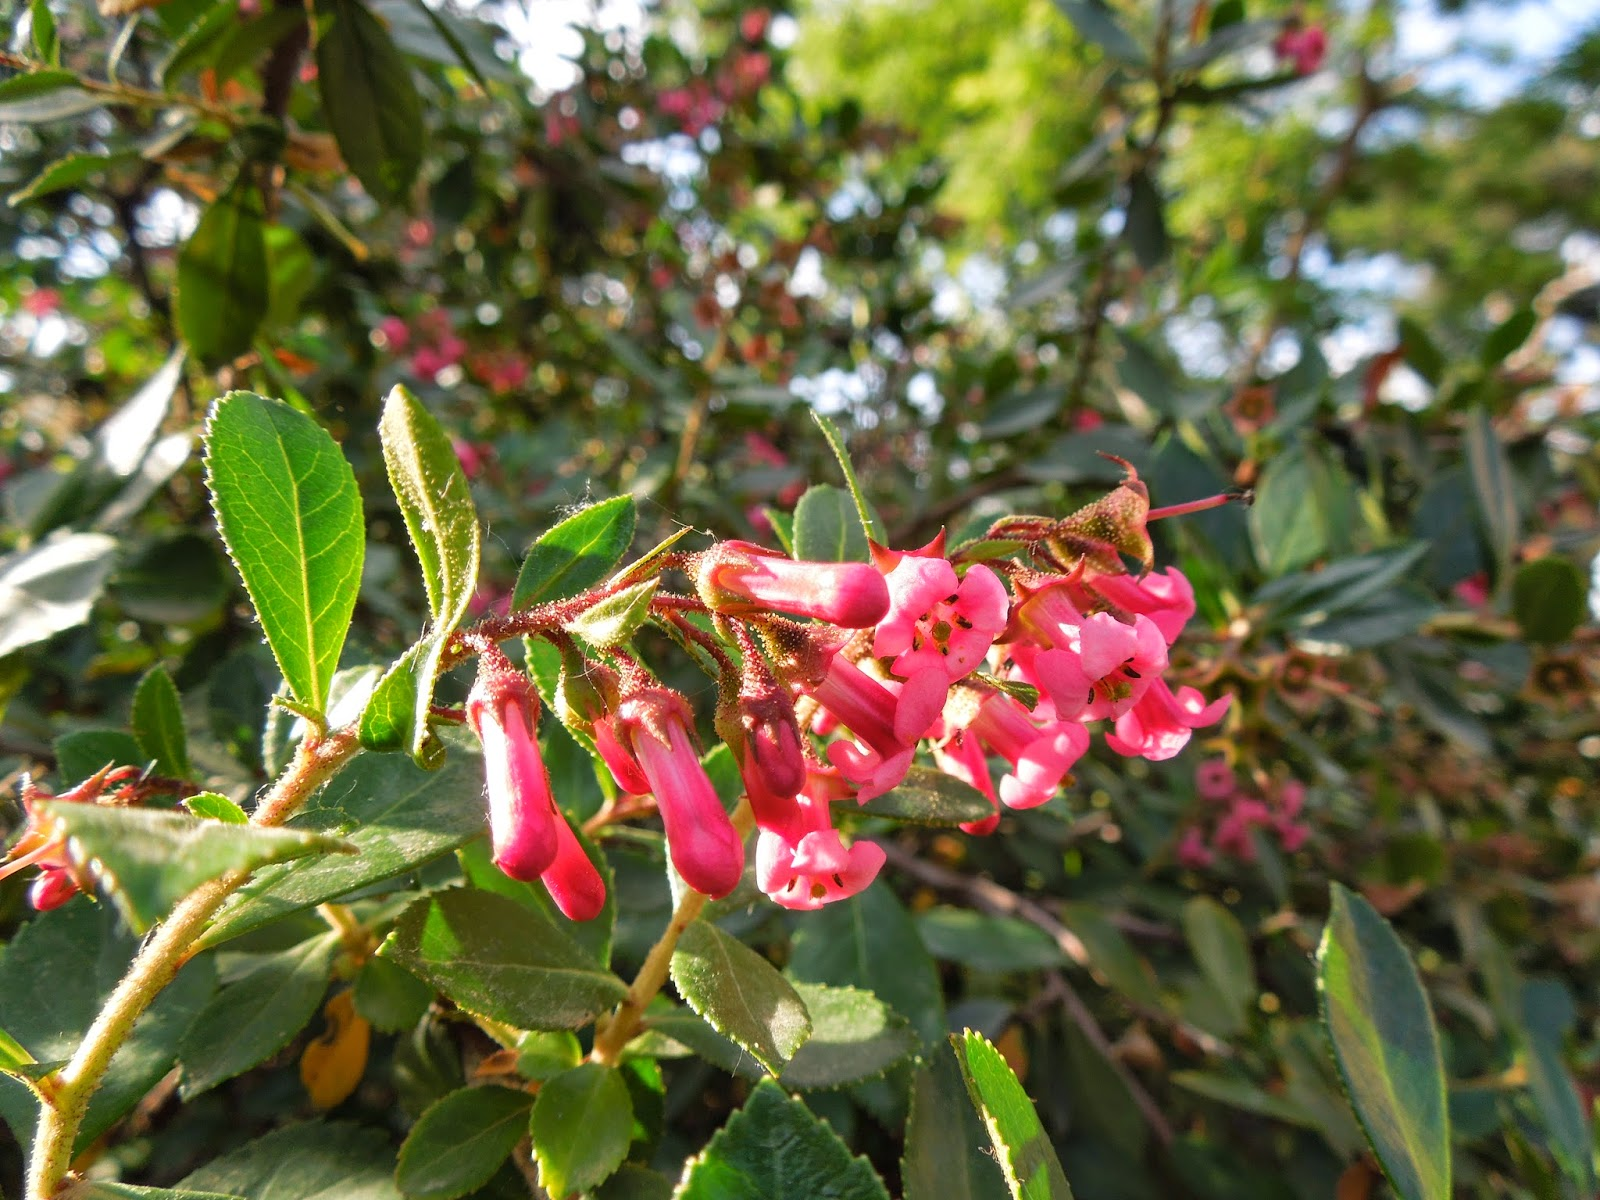 Dos arbustos ornamentales bot nic serrat for Tipos de arbustos ornamentales